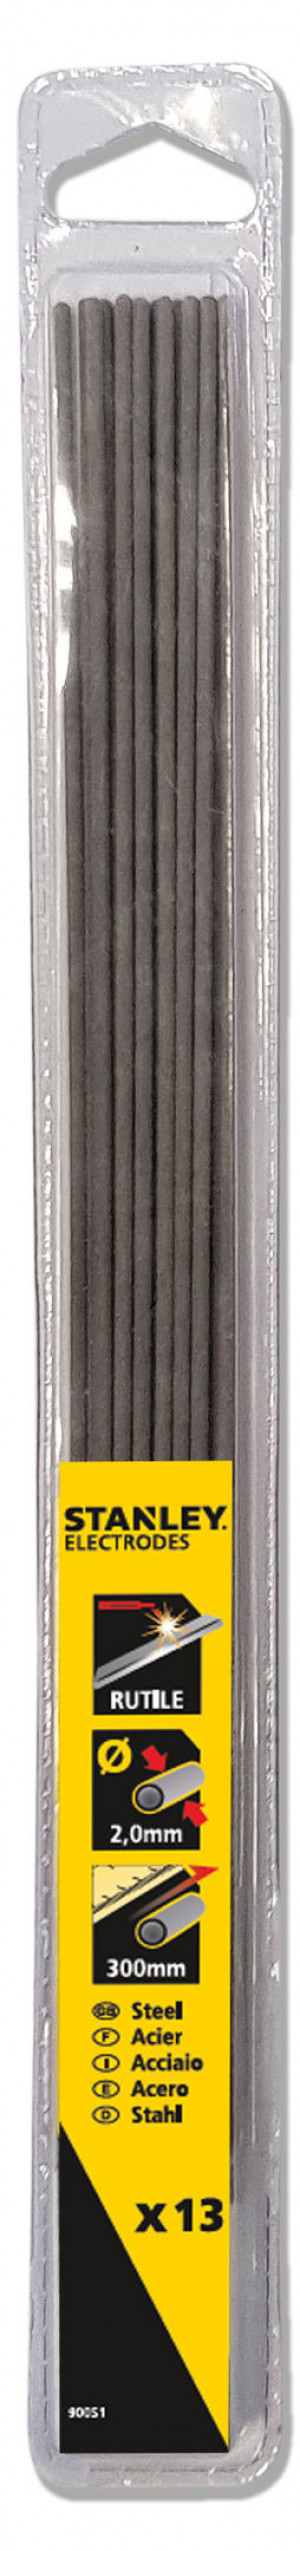 Stanley elektroder rutile 2,0 mm 13 stk.